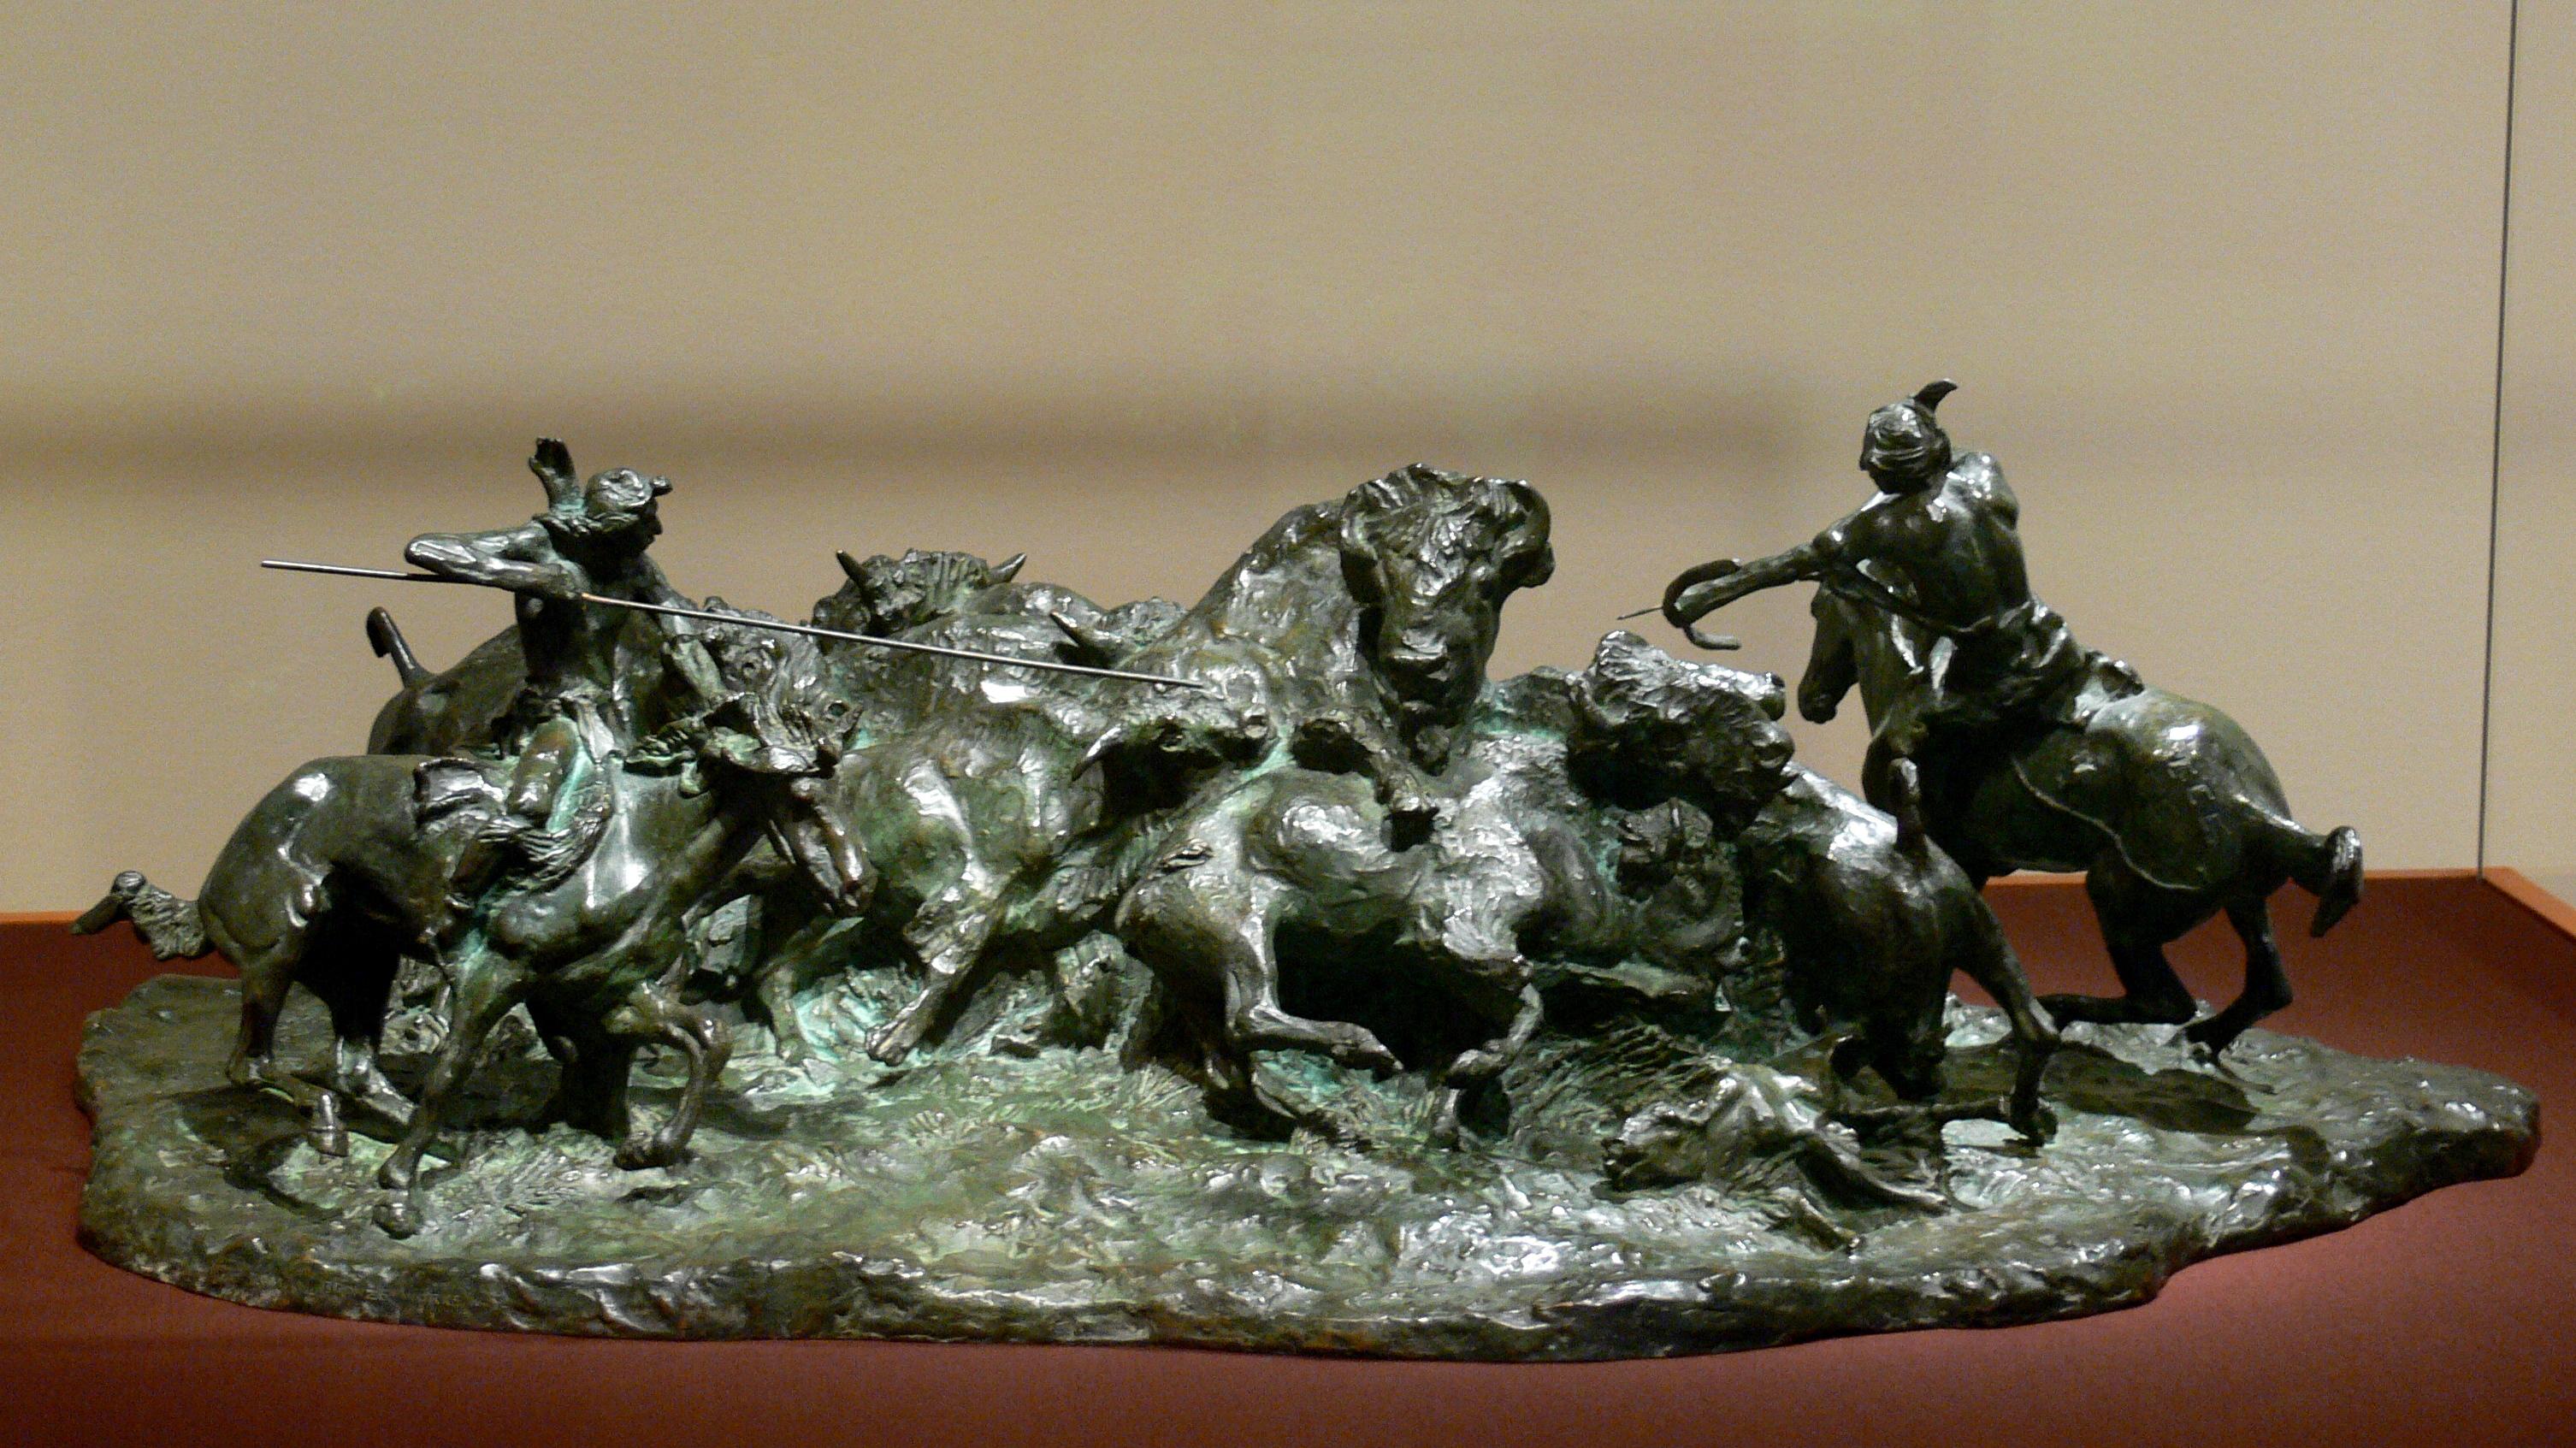 FileRussell Meat For Wild Men Amon Carter Museumjpg Wikimedia - Museums for sale in us